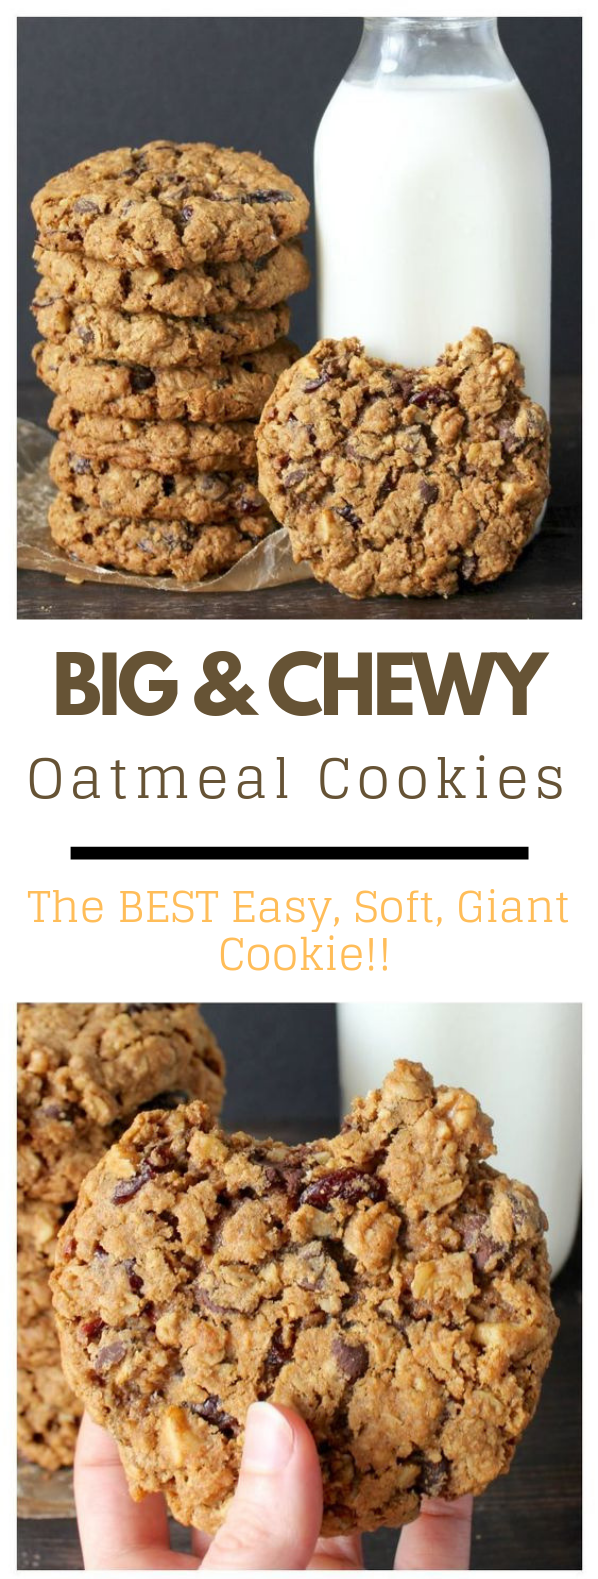 BIG AND CHEWY OATMEAL COOKIES #cookies #oatmeal